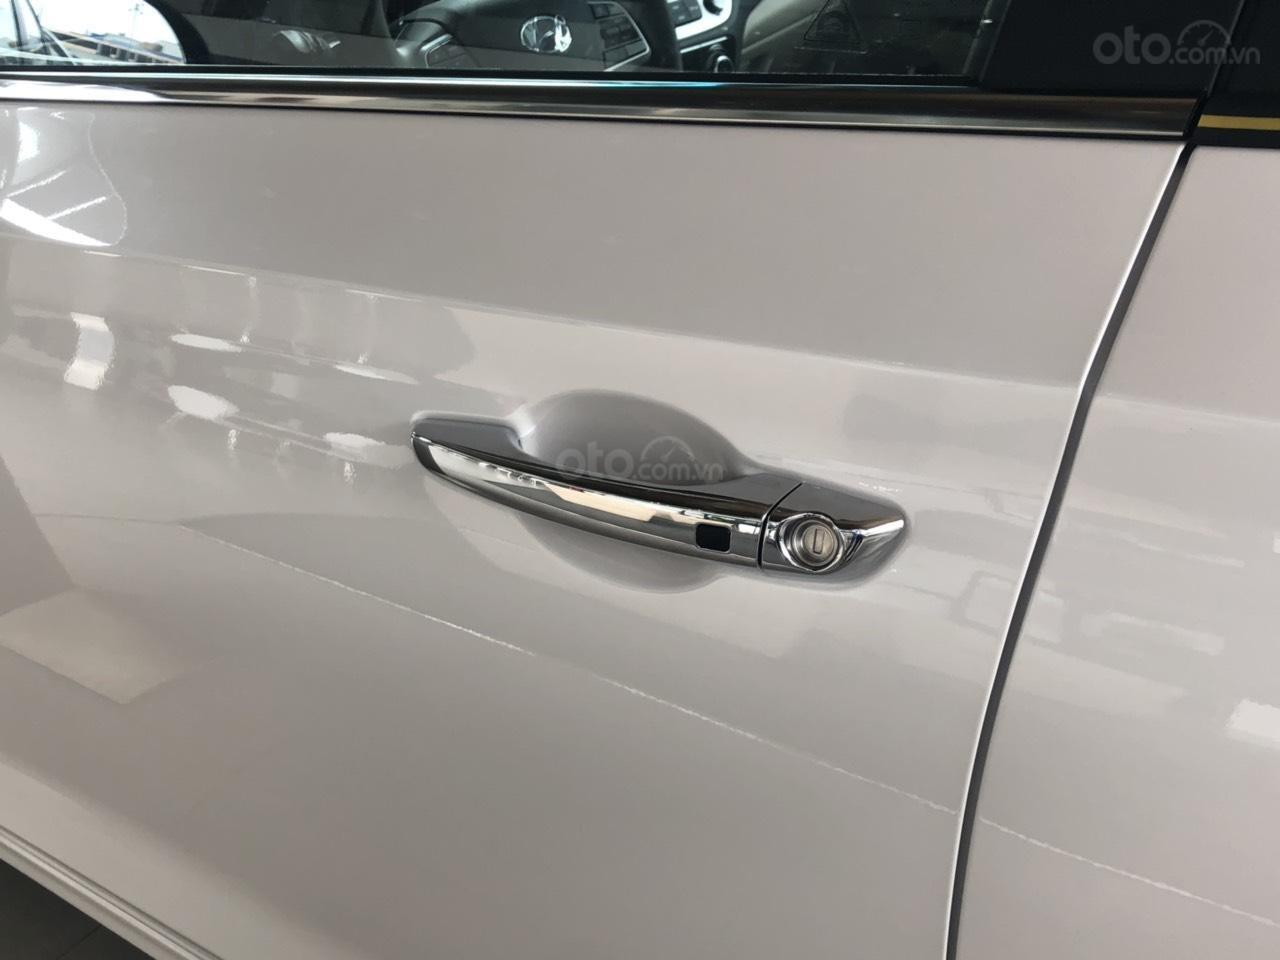 Bán Hyundai Accent 2019 - Giá tốt - xe sẵn - Bank bao đậu (6)